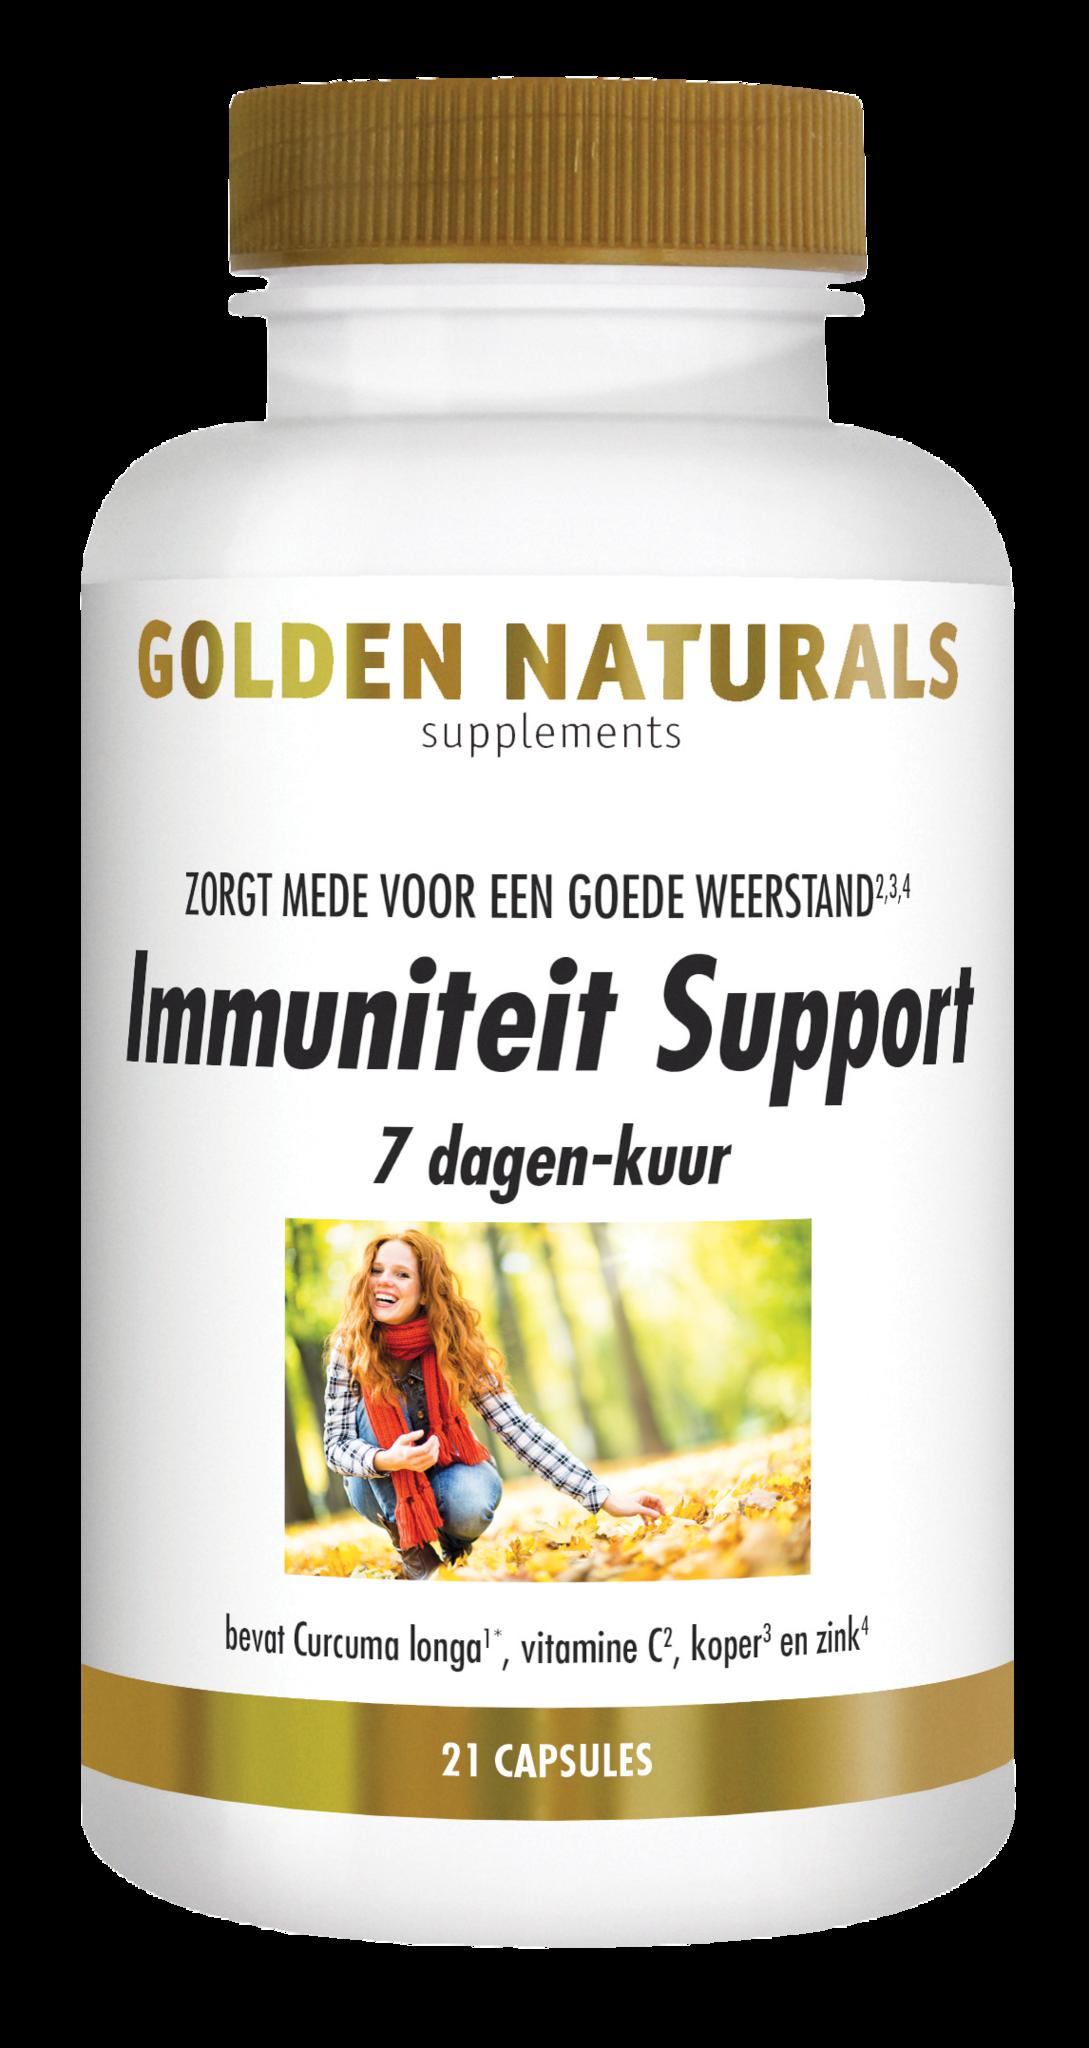 Golden Naturals Immuniteit Support 7 dagen-kuur